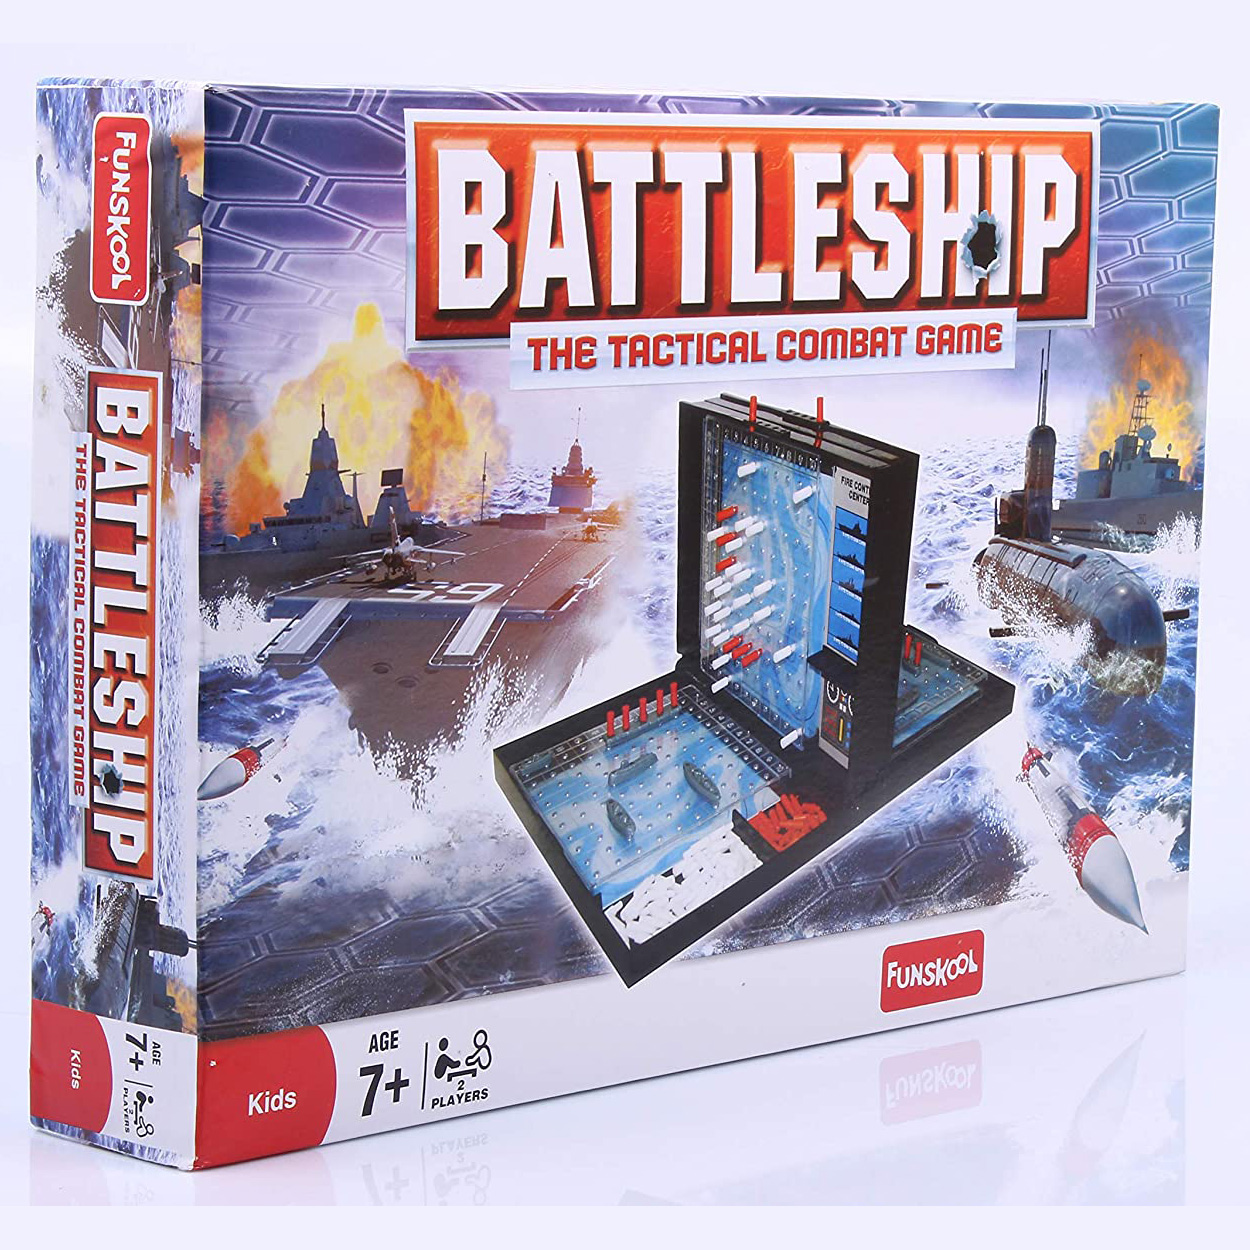 Funskool Battleship Board Game Multiplayer Indoor Game Buy Online At Best Prices In Bangladesh Daraz Com Bd